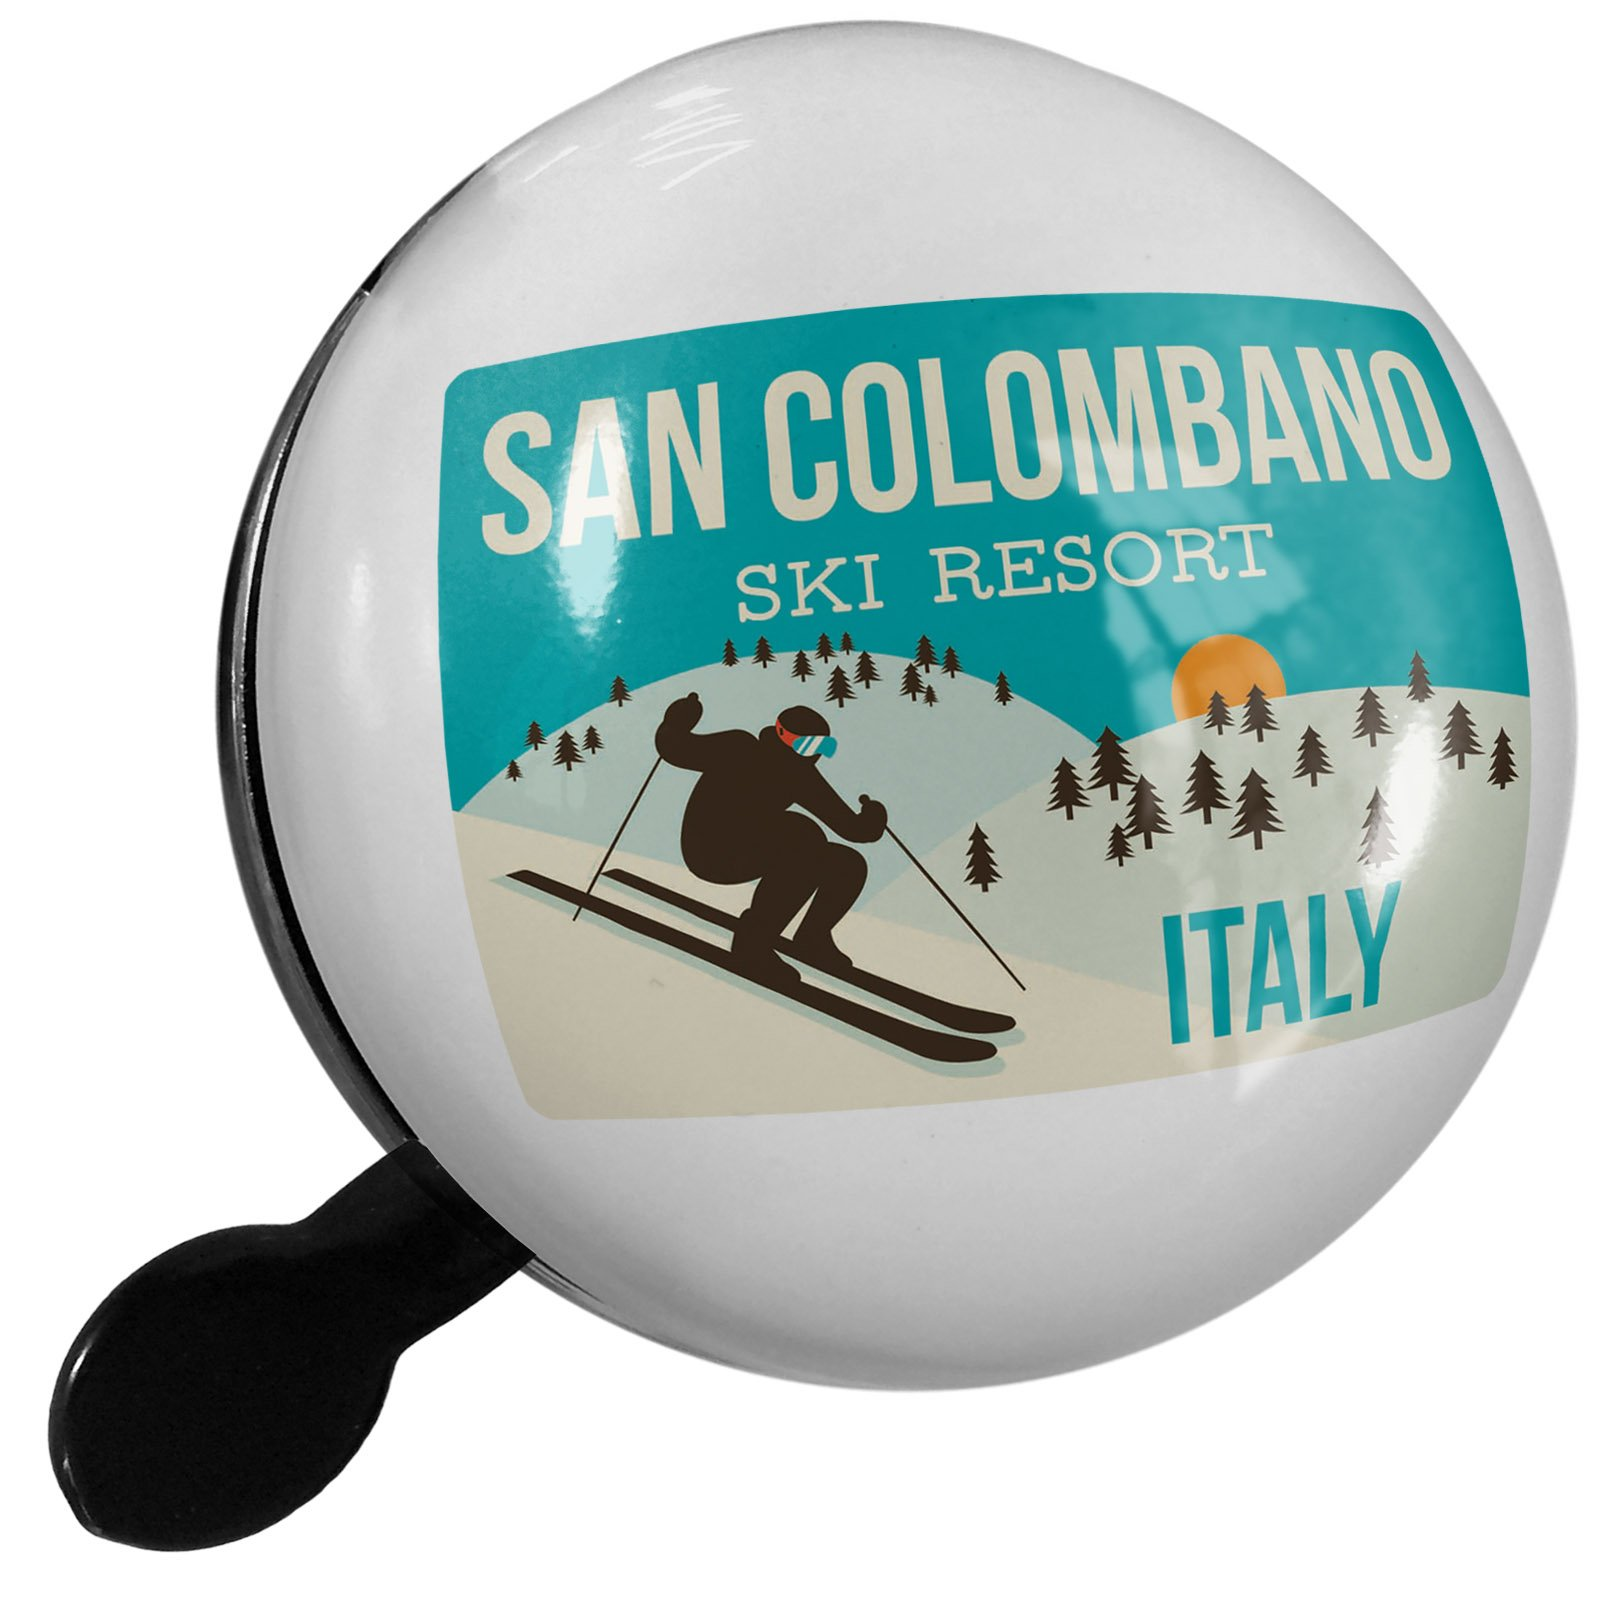 Small Bike Bell San Colombano Ski Resort - Italy Ski Resort - NEONBLOND